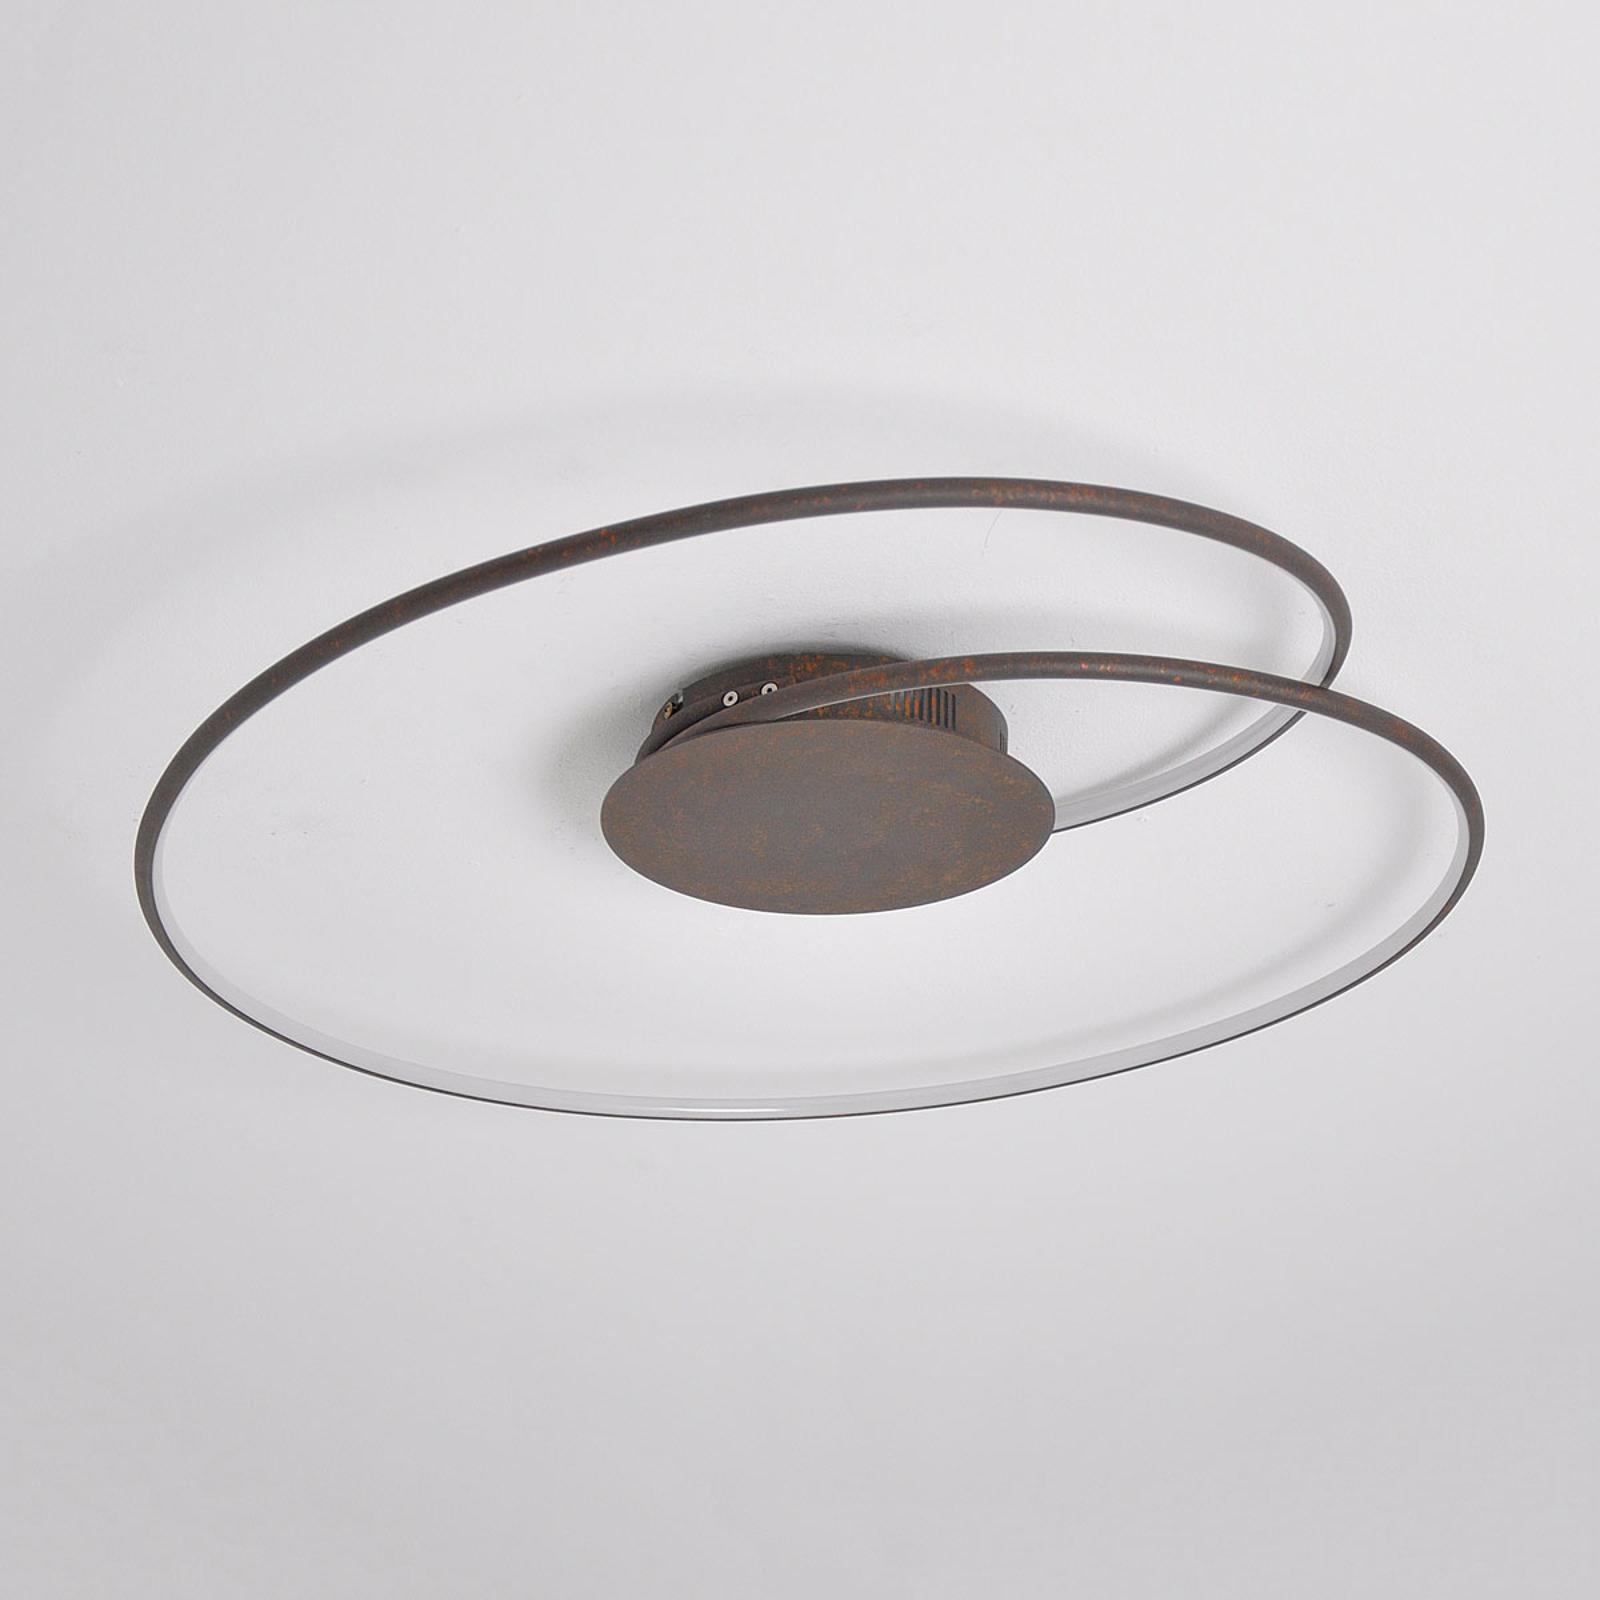 LED-Deckenlampe Joline, rostbraun, 74 cm